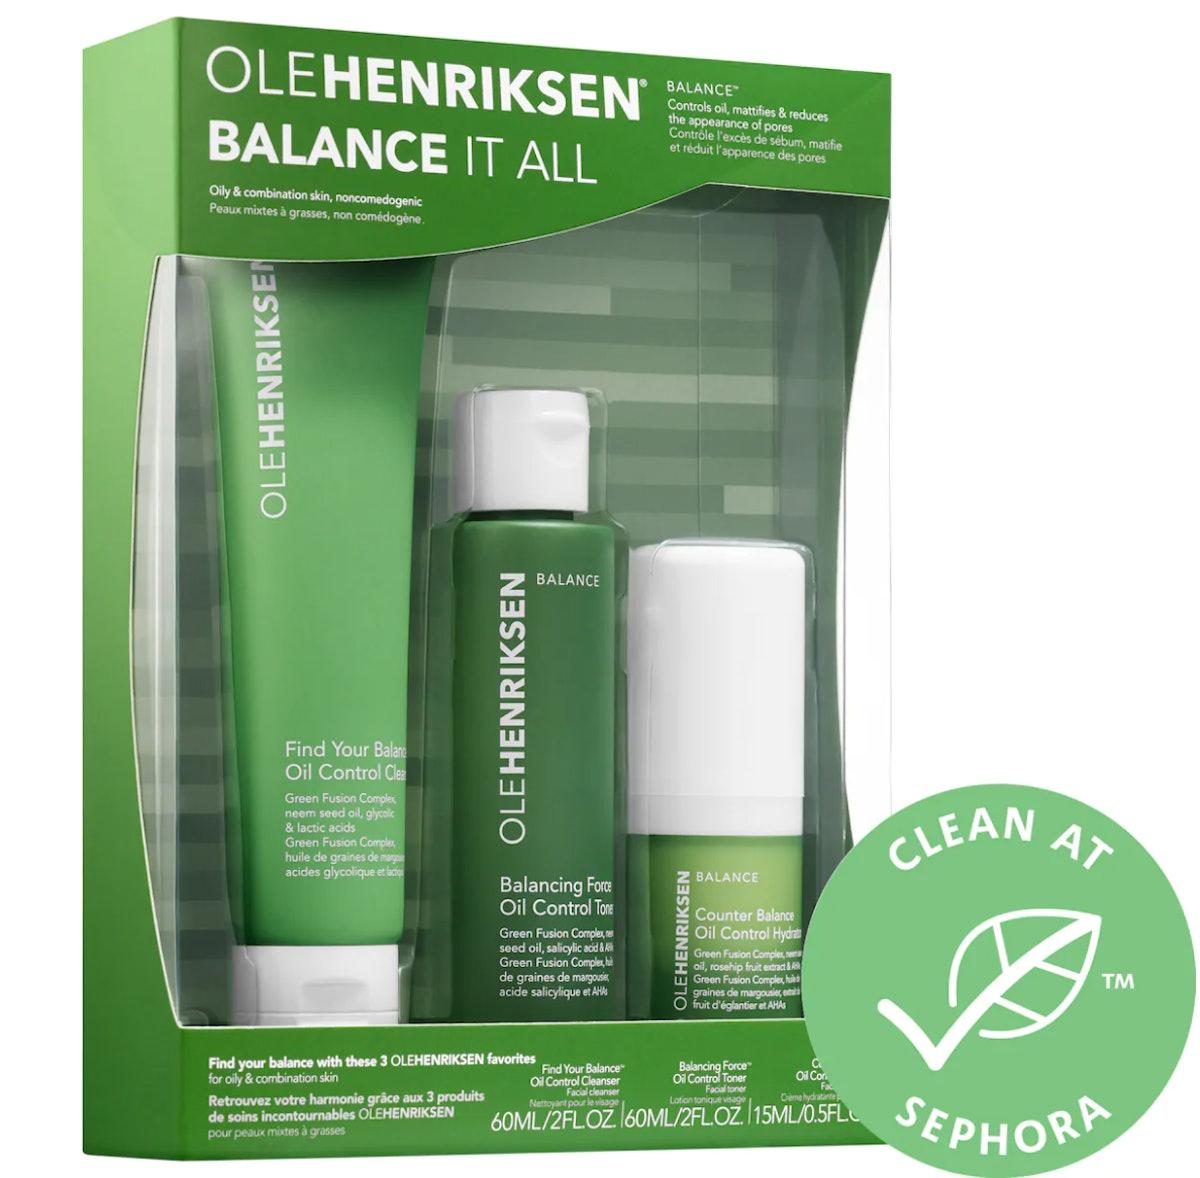 OLEHENRIKSEN Balance It All™ Essentials Set